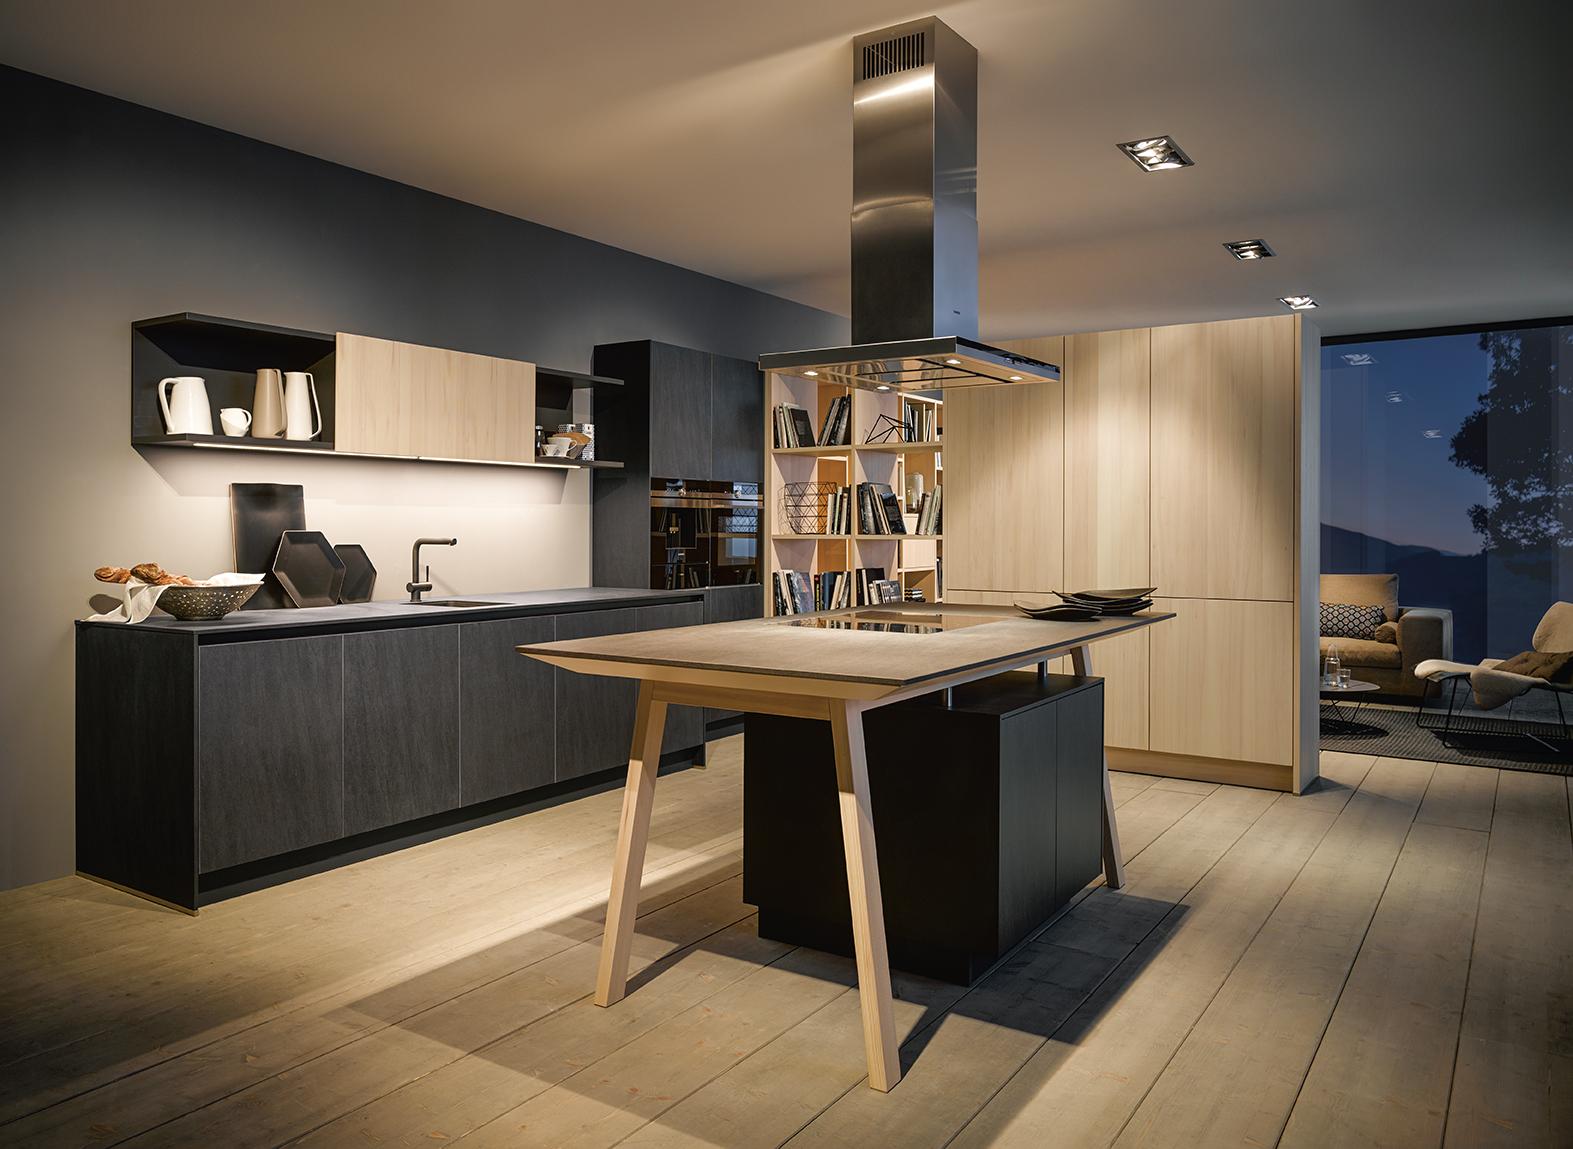 Next125 designer kitchen by Hubble